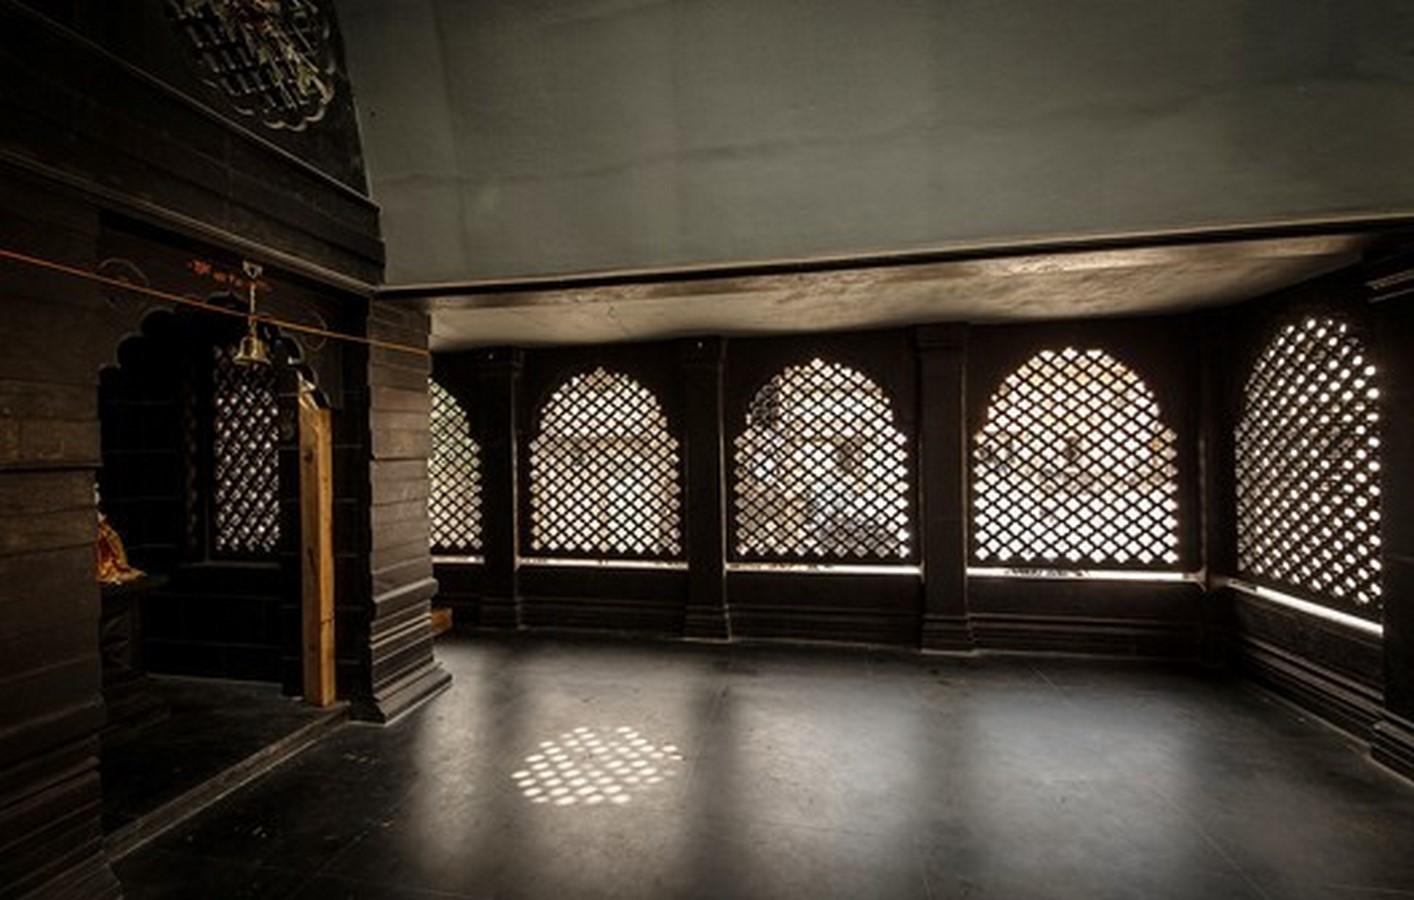 Maruti Mandir by Shailesh Devi: At the Centre of the Village - Sheet7